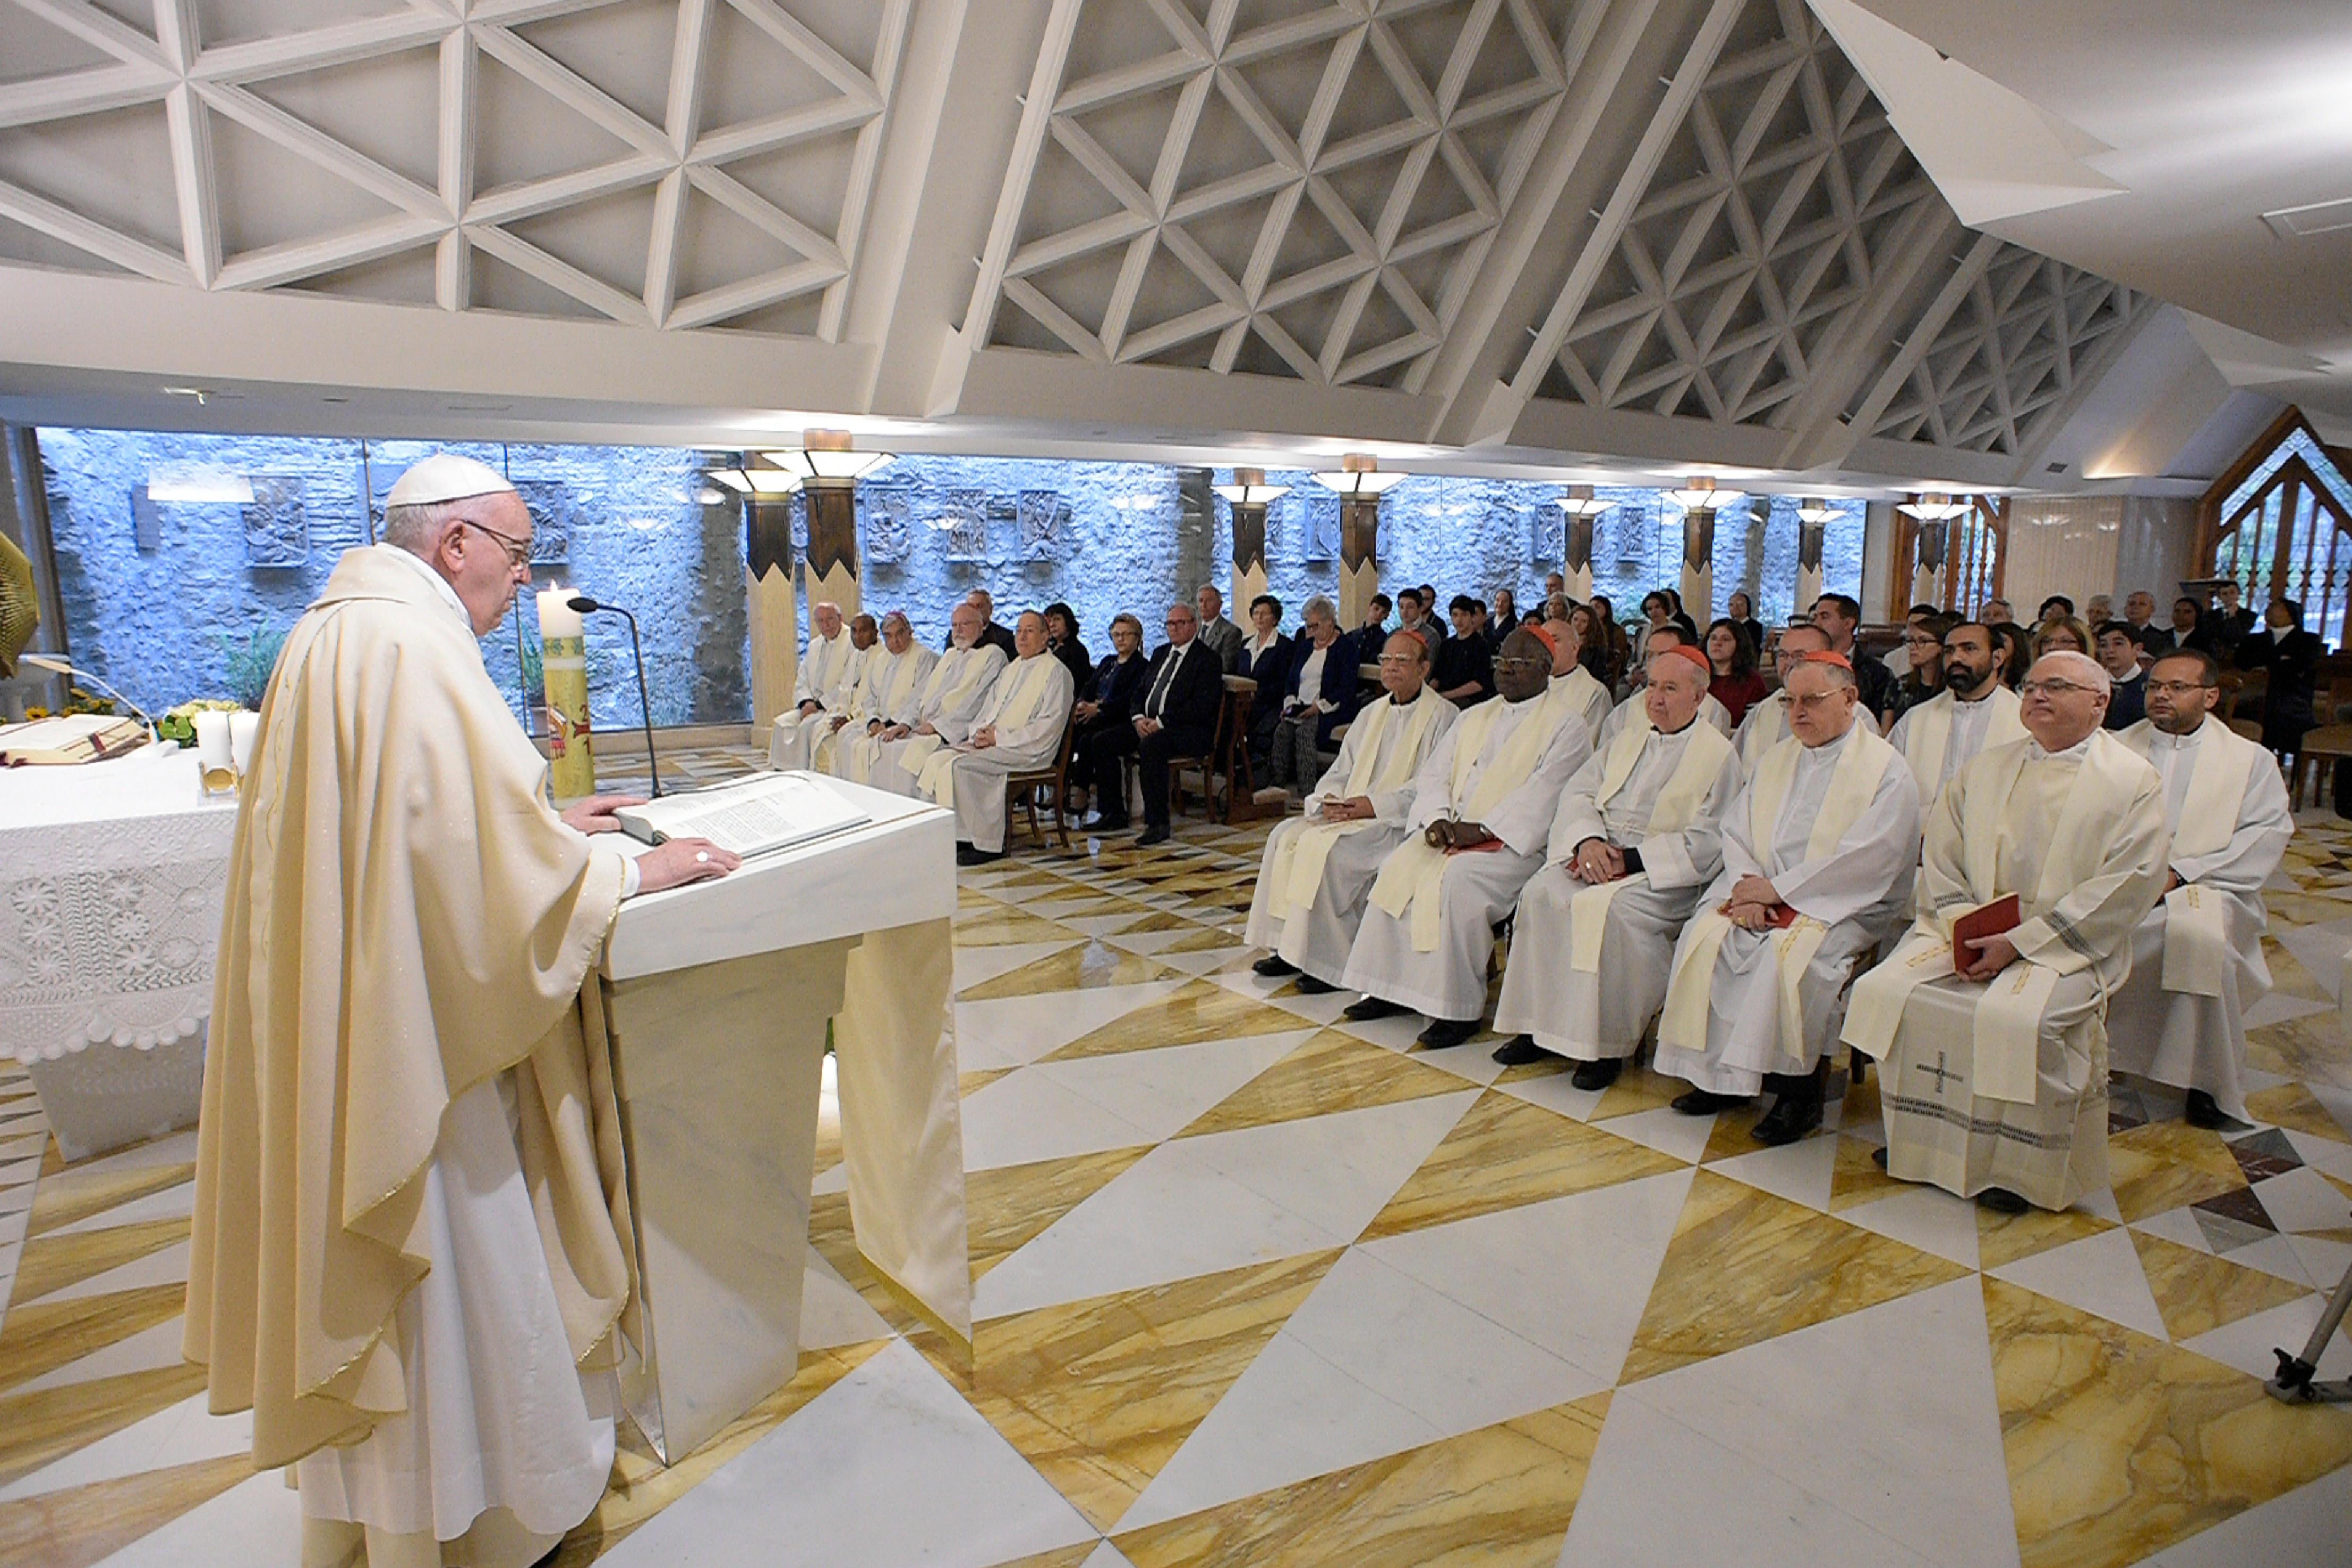 Misa del Papa en Santa Marta 24 abril 2018 © Vatican Media